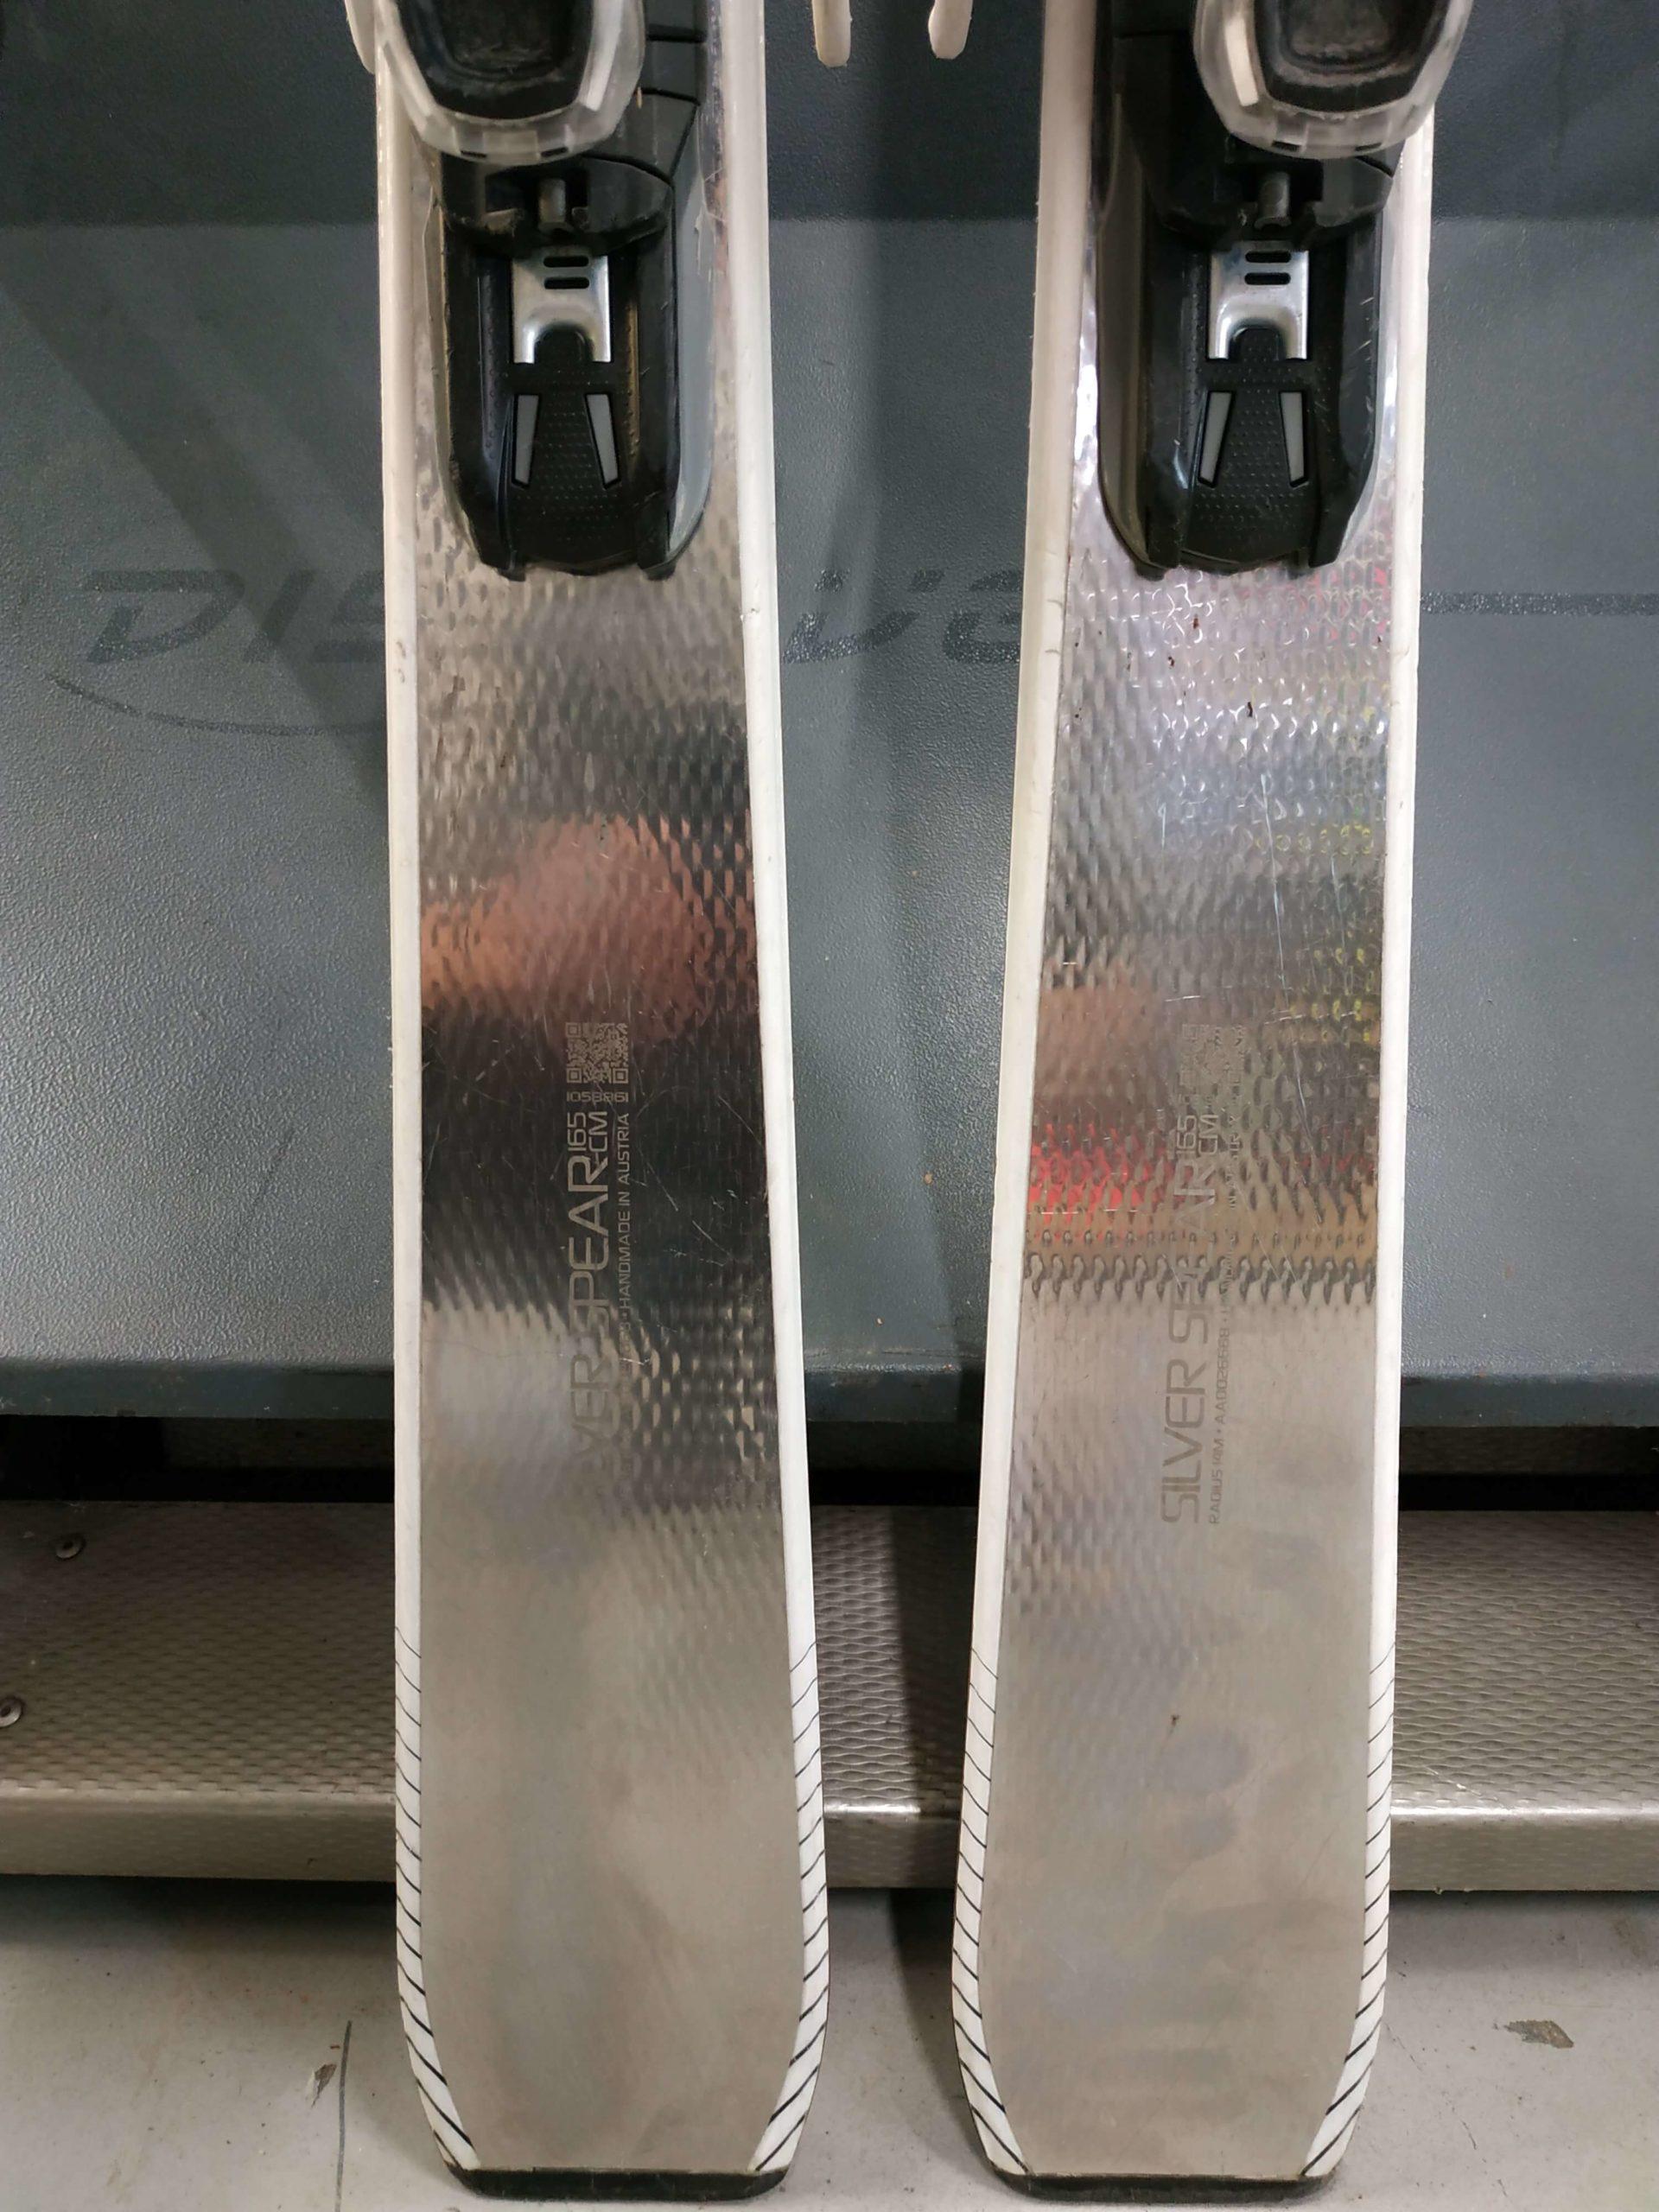 15. Volant Silver Spear 165 (5) R14